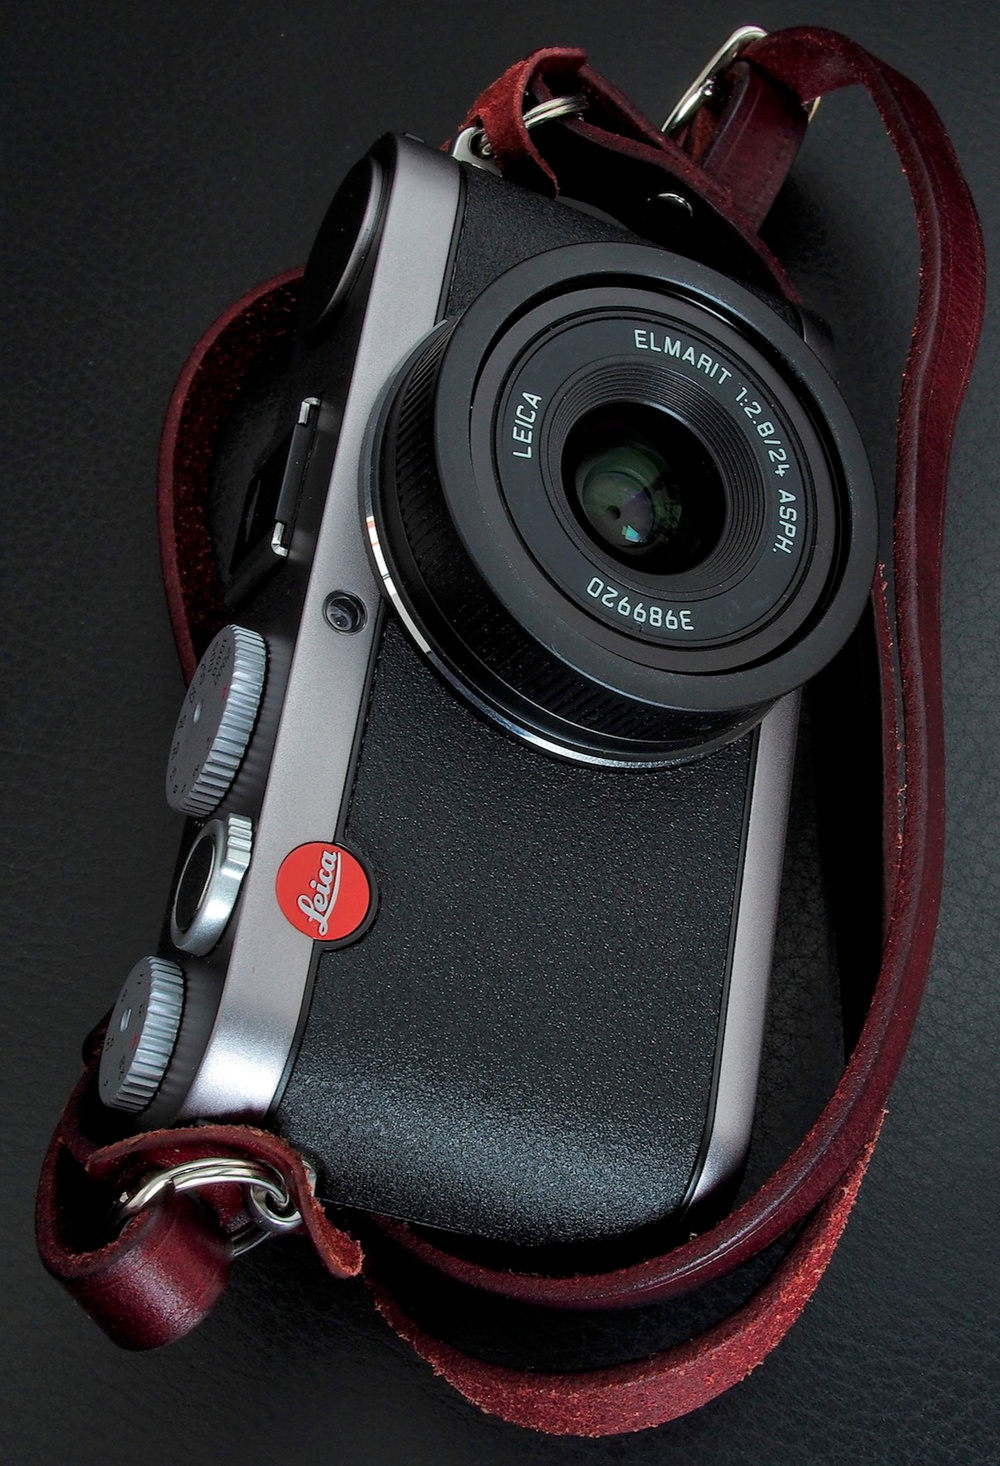 The Leica X1